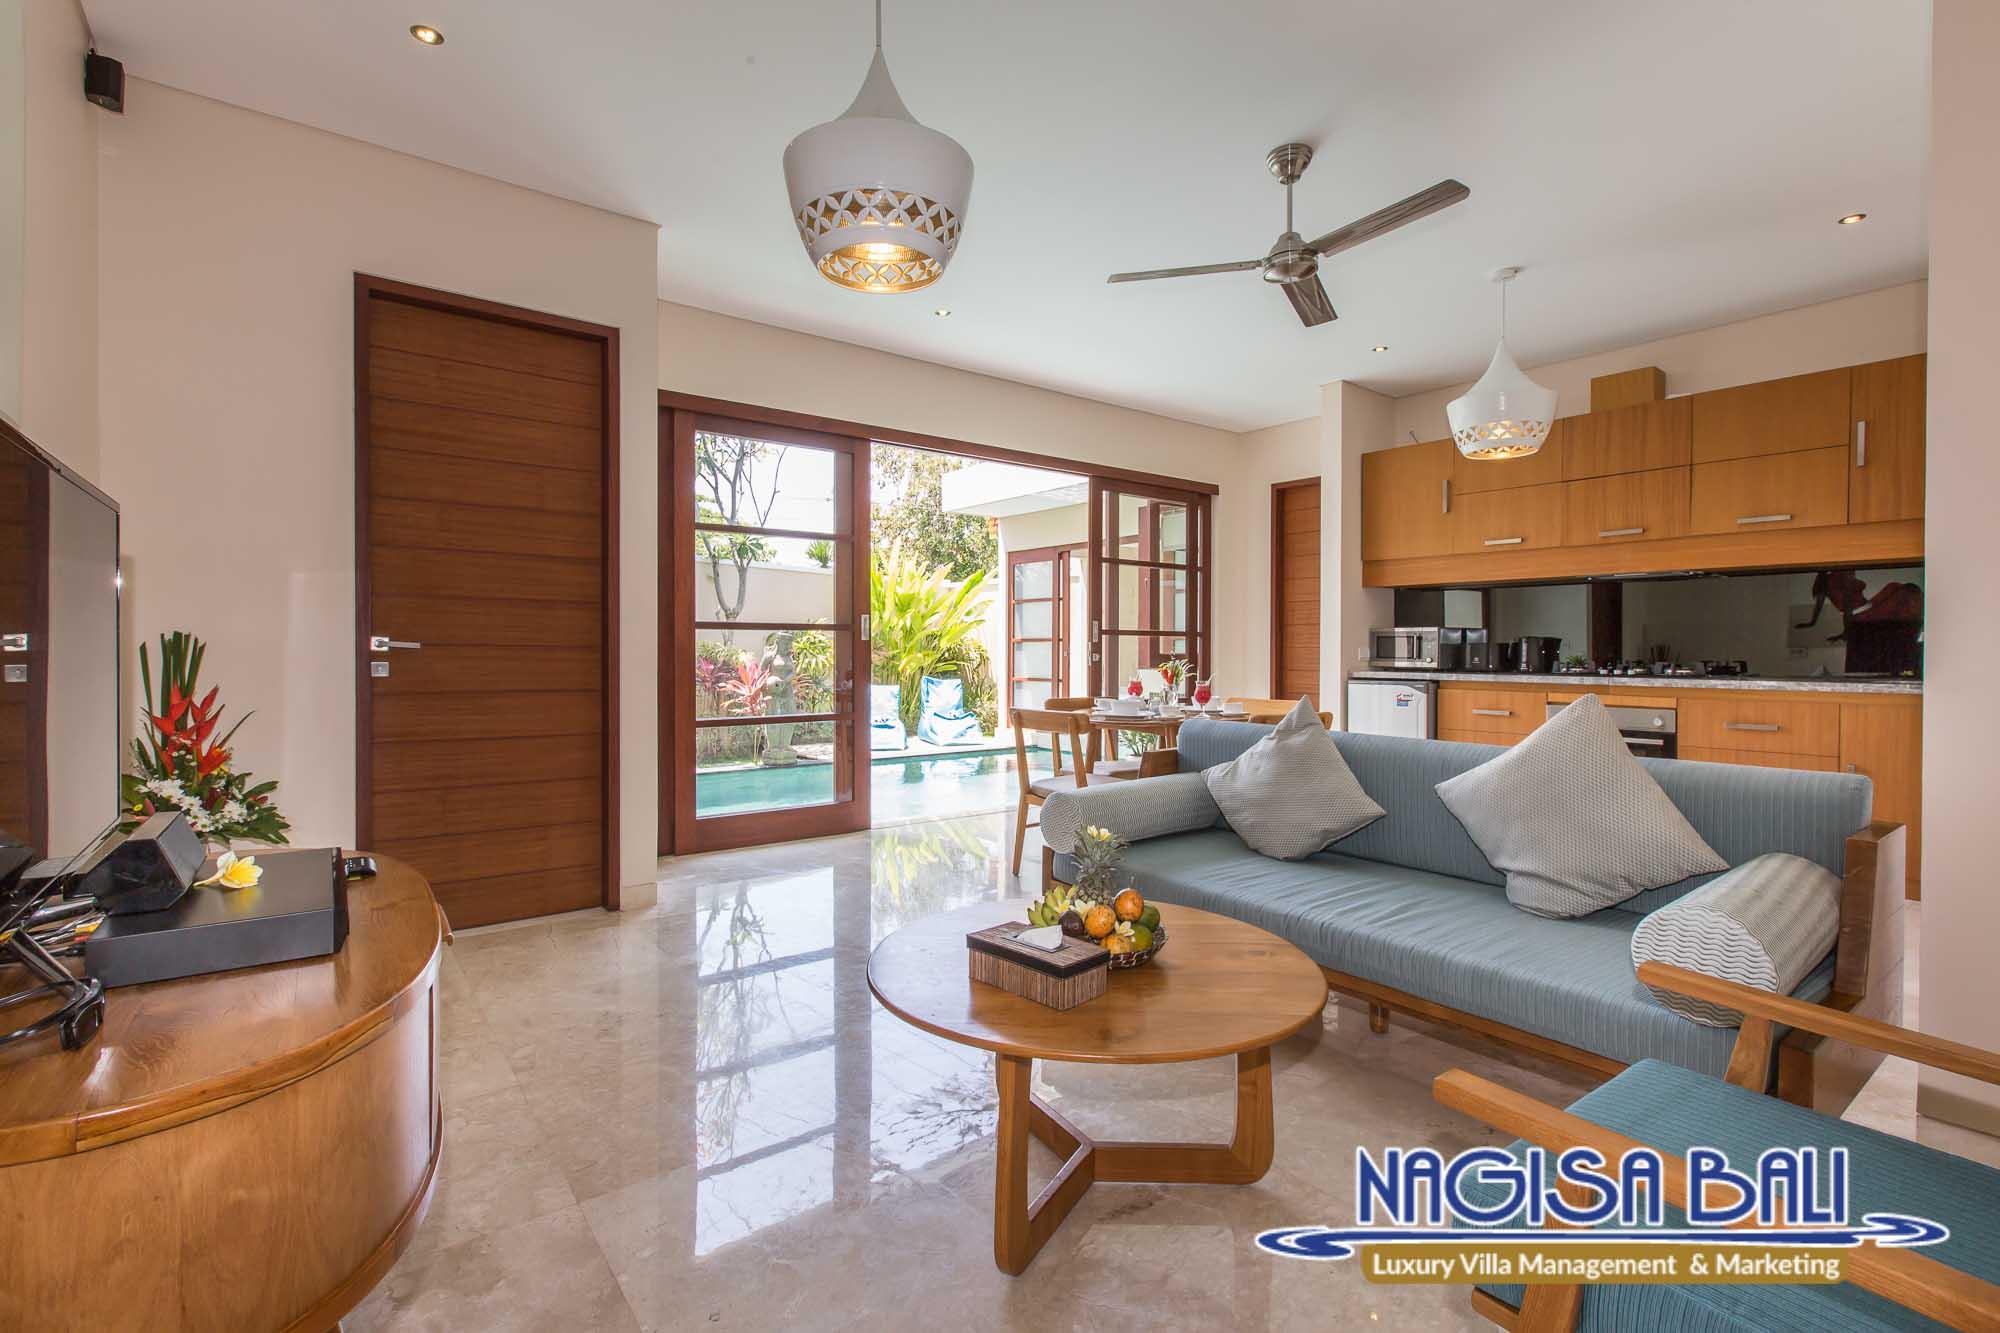 1 Bedroom Villa in Legian, Bali